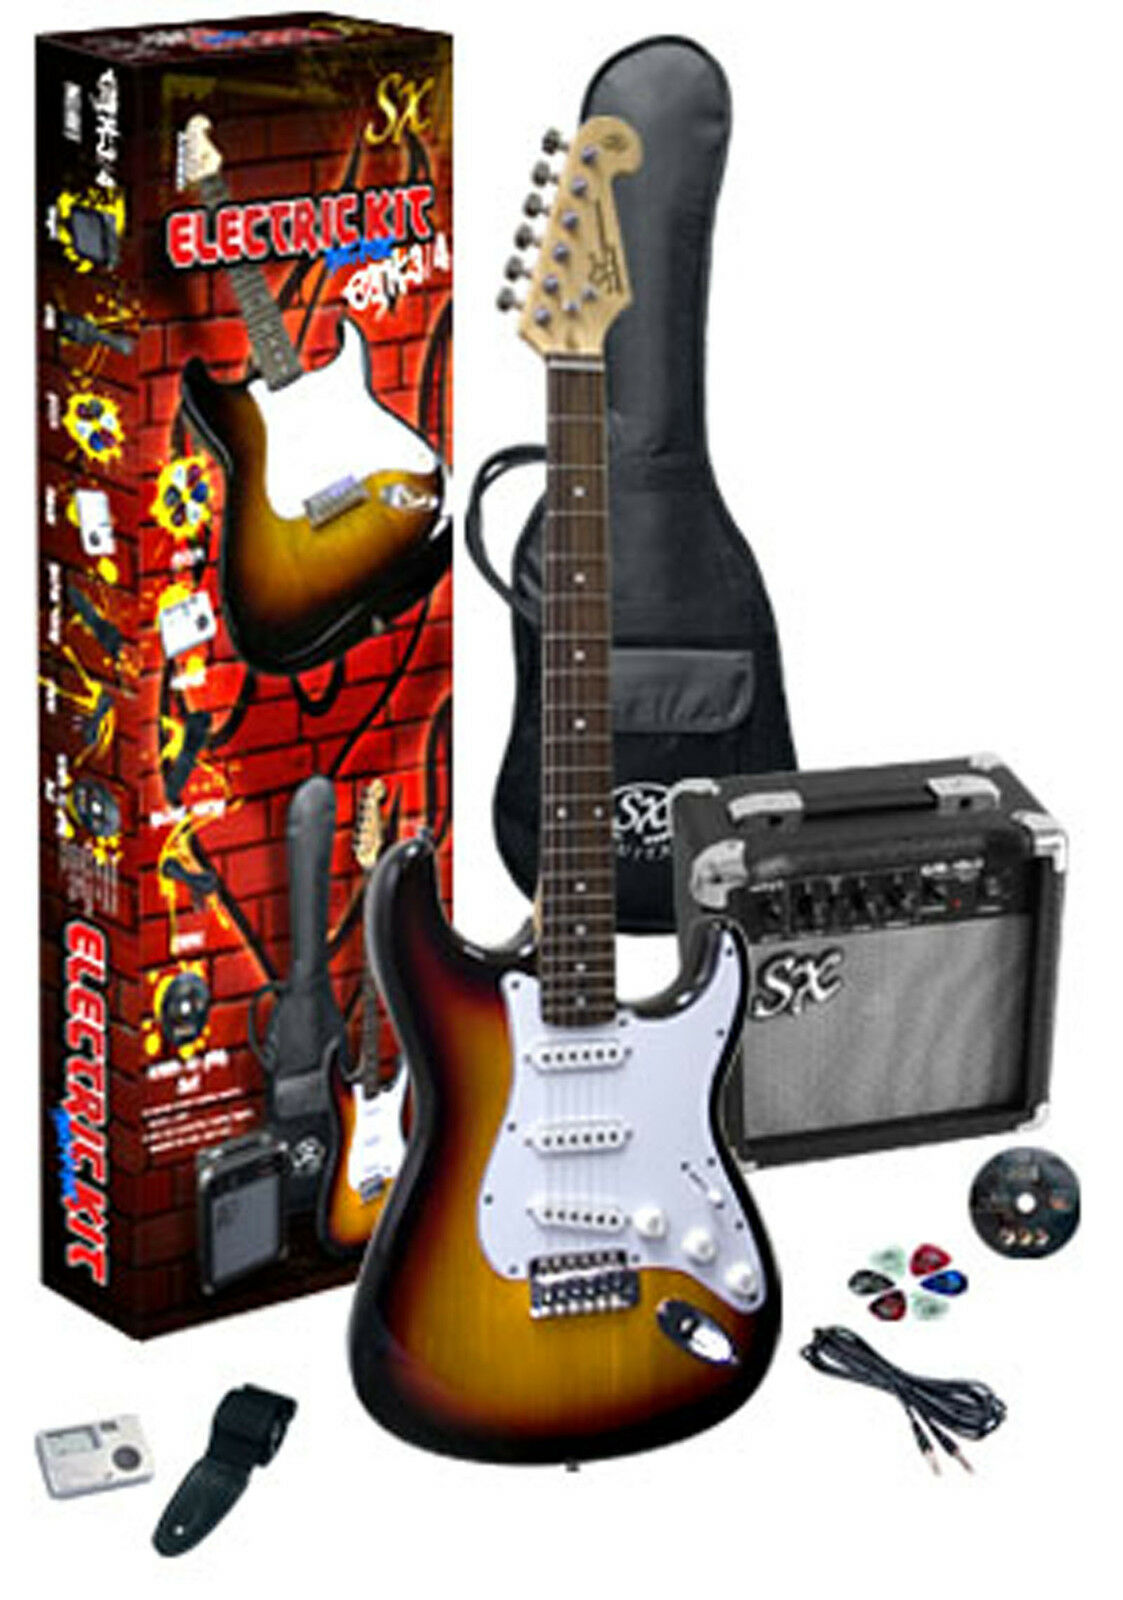 3 4 Electric Guitar package - traveller guitar amp accessories tobacco sunburst